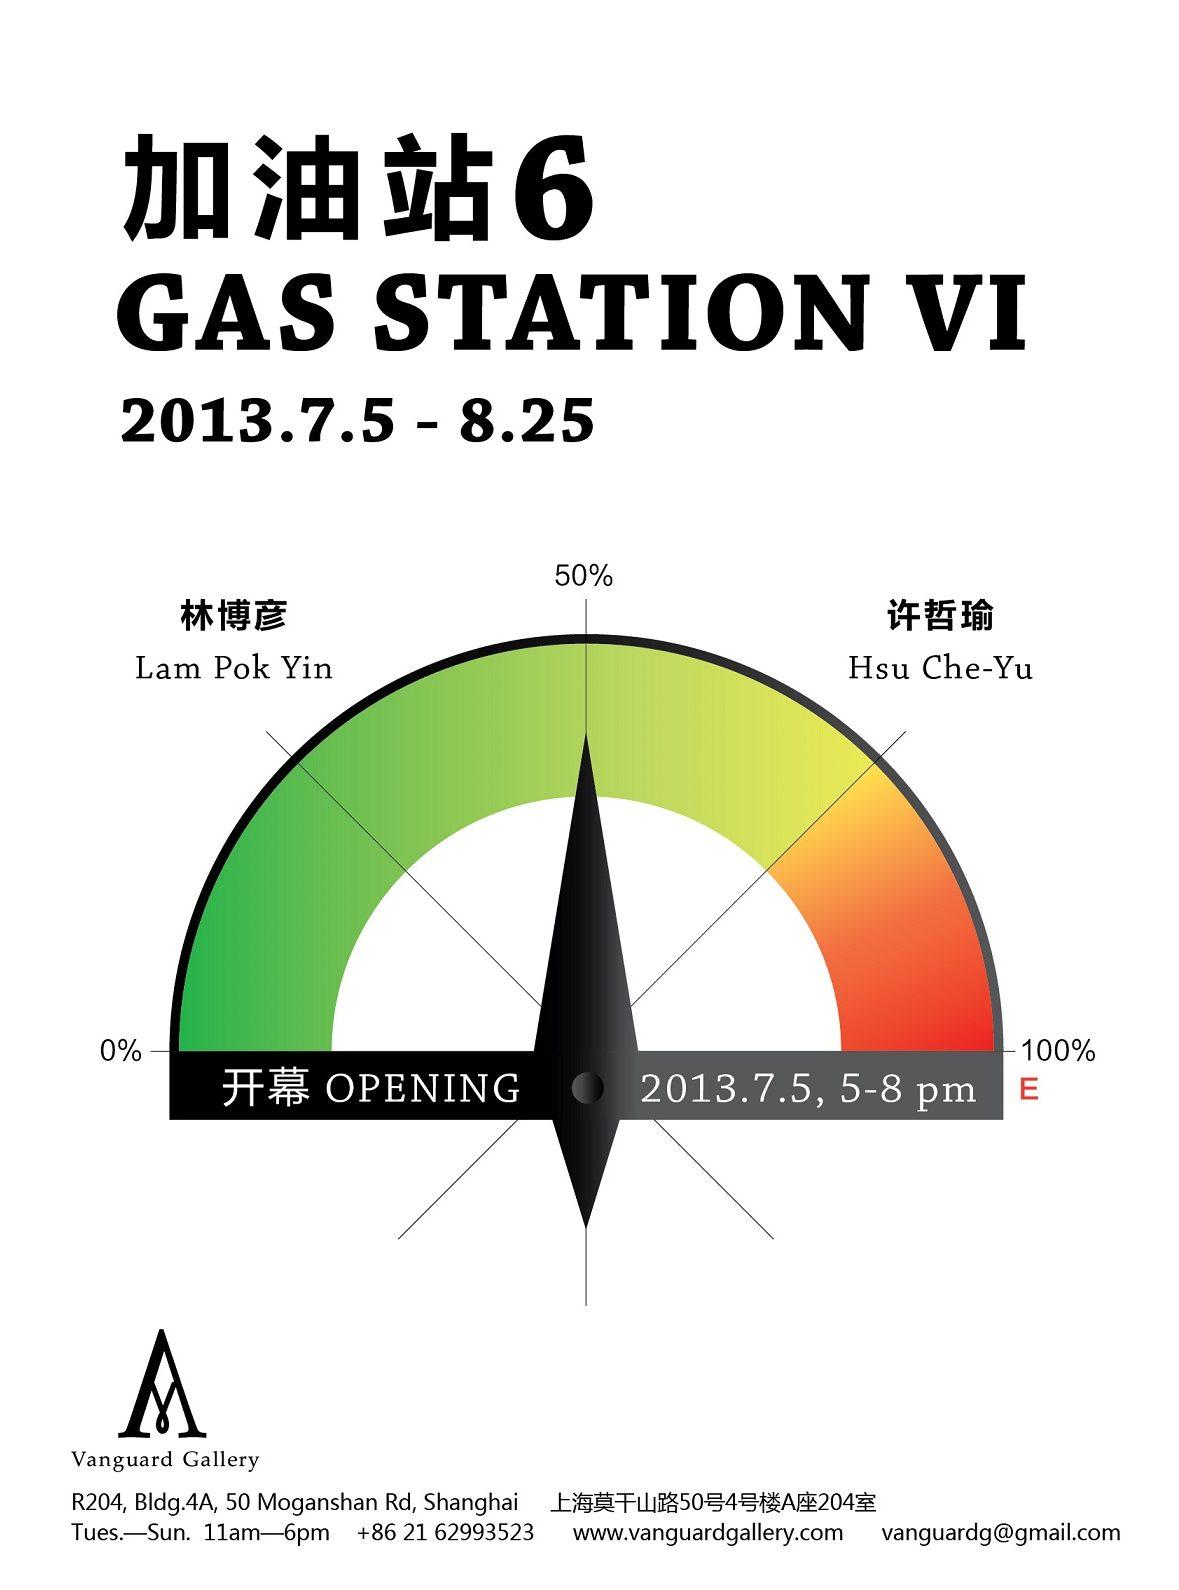 Gas Station VI